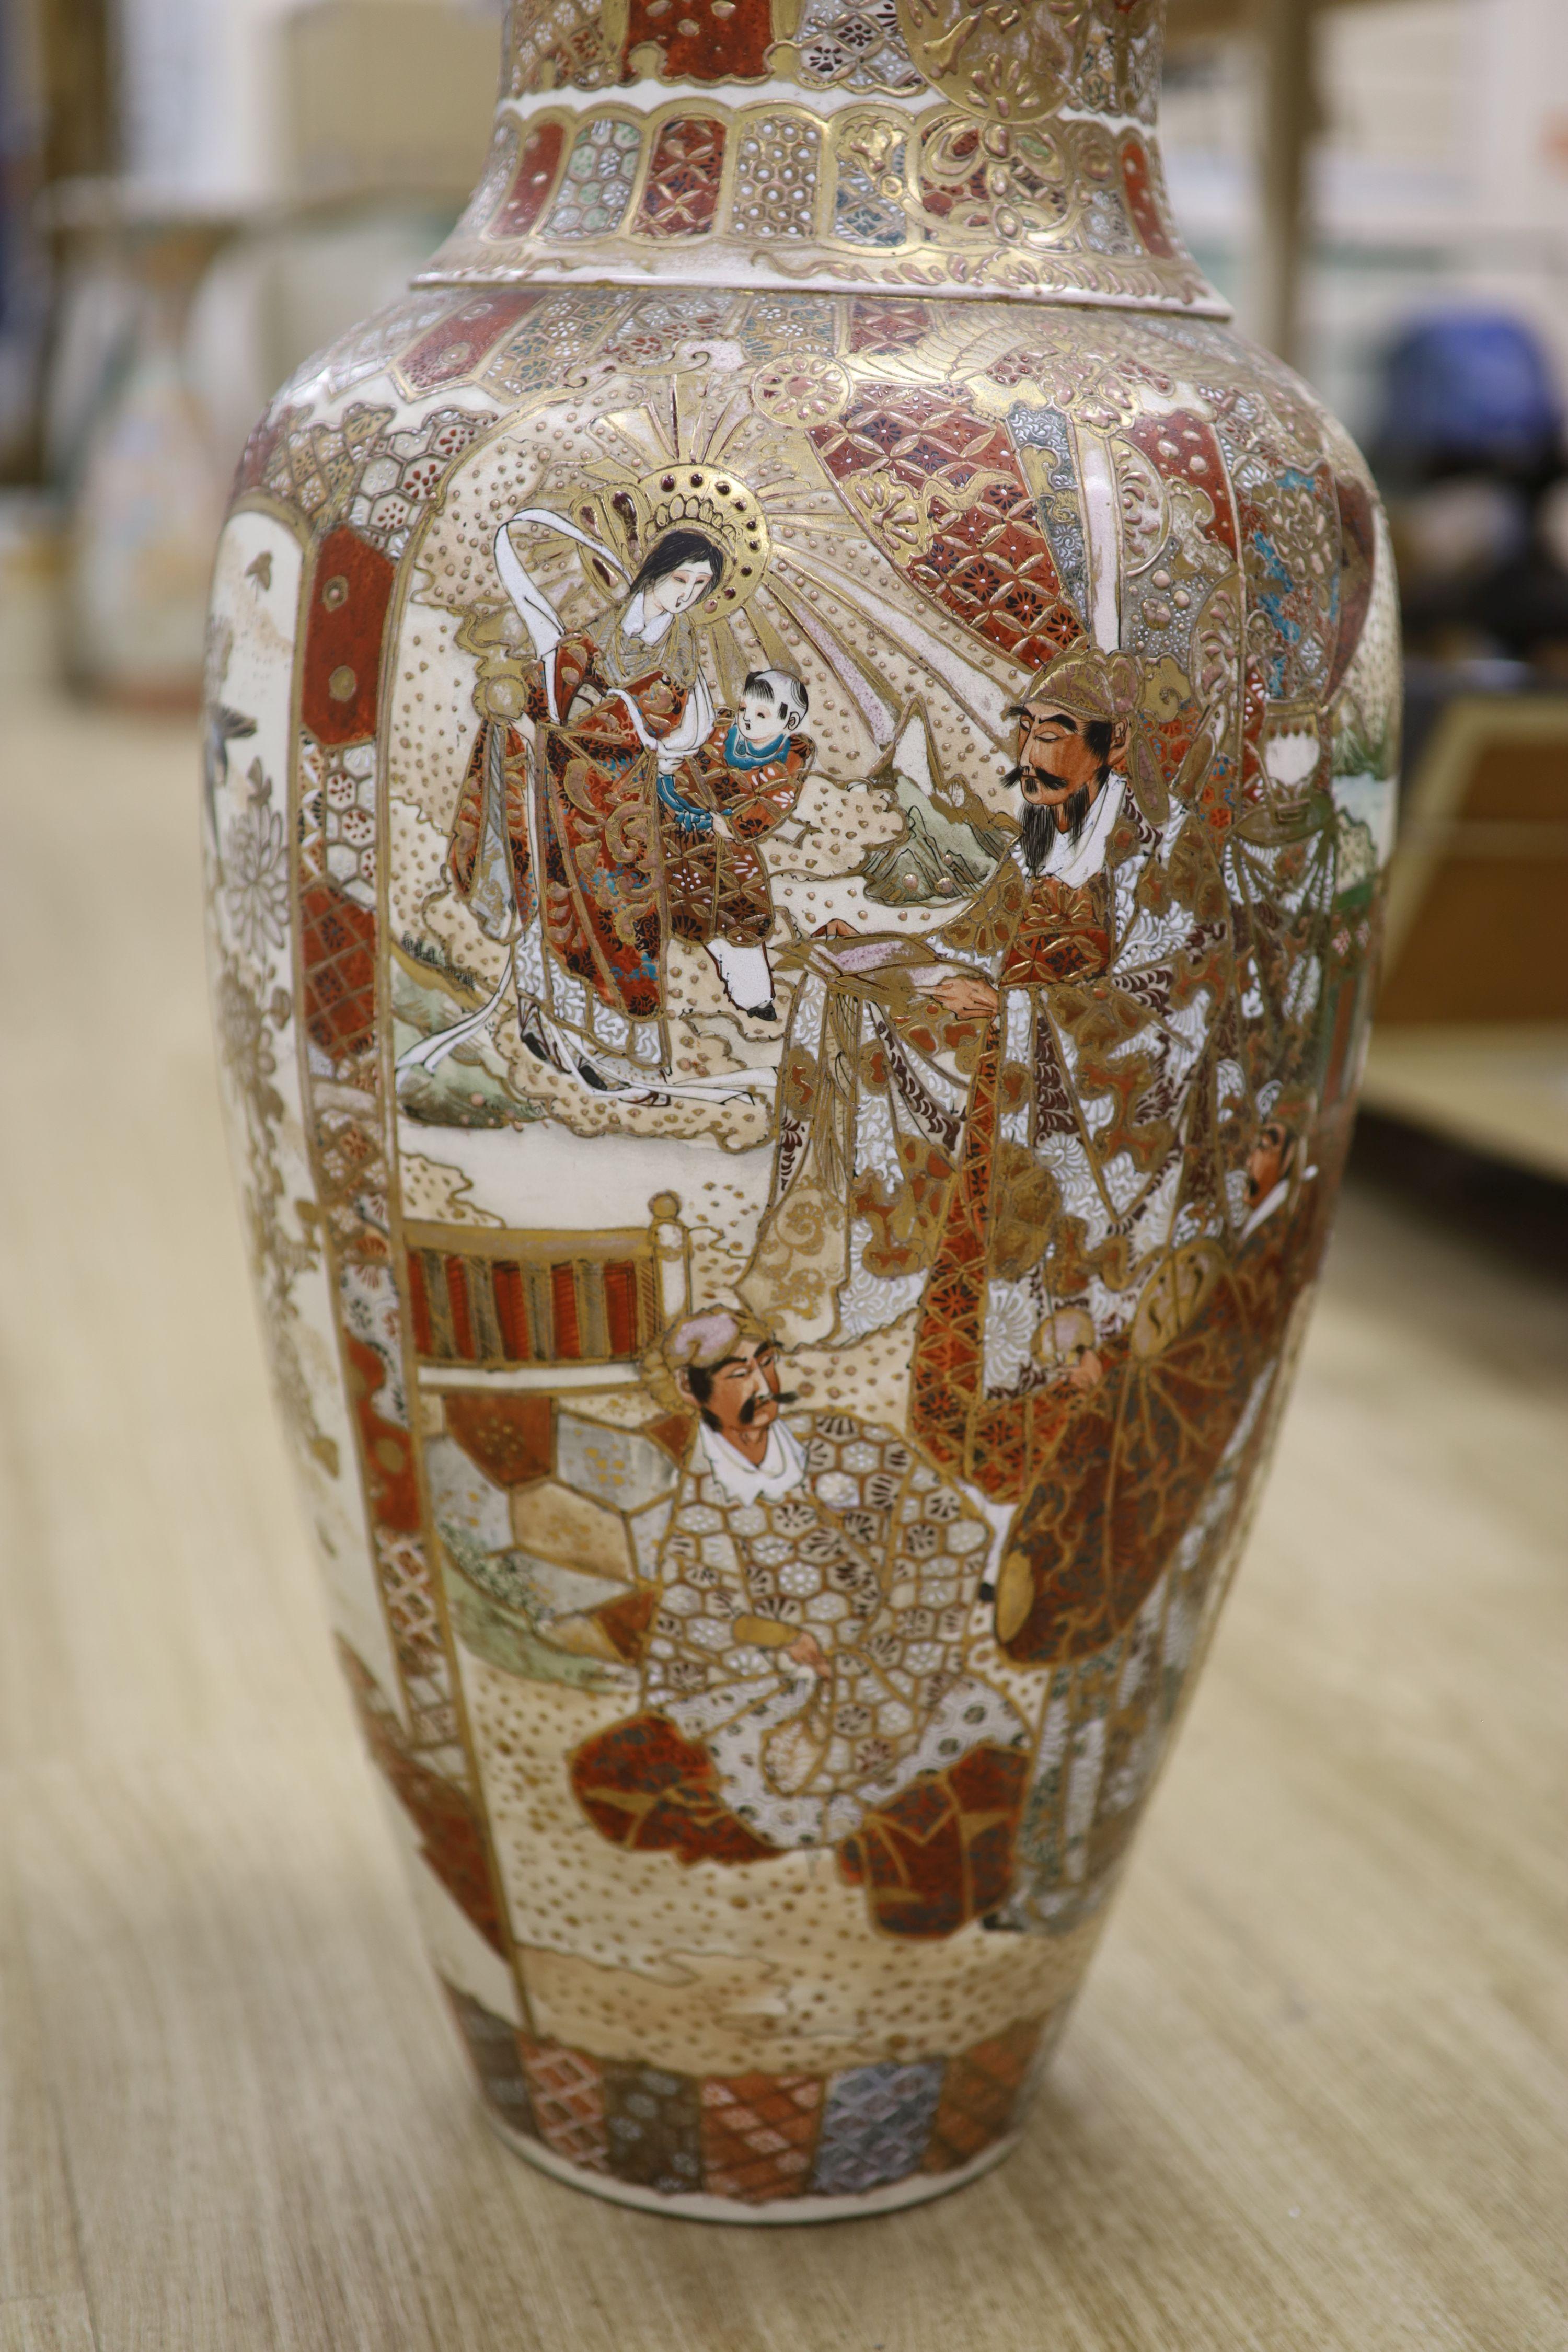 A large Satsuma pottery vase, height 63cm - Image 4 of 8